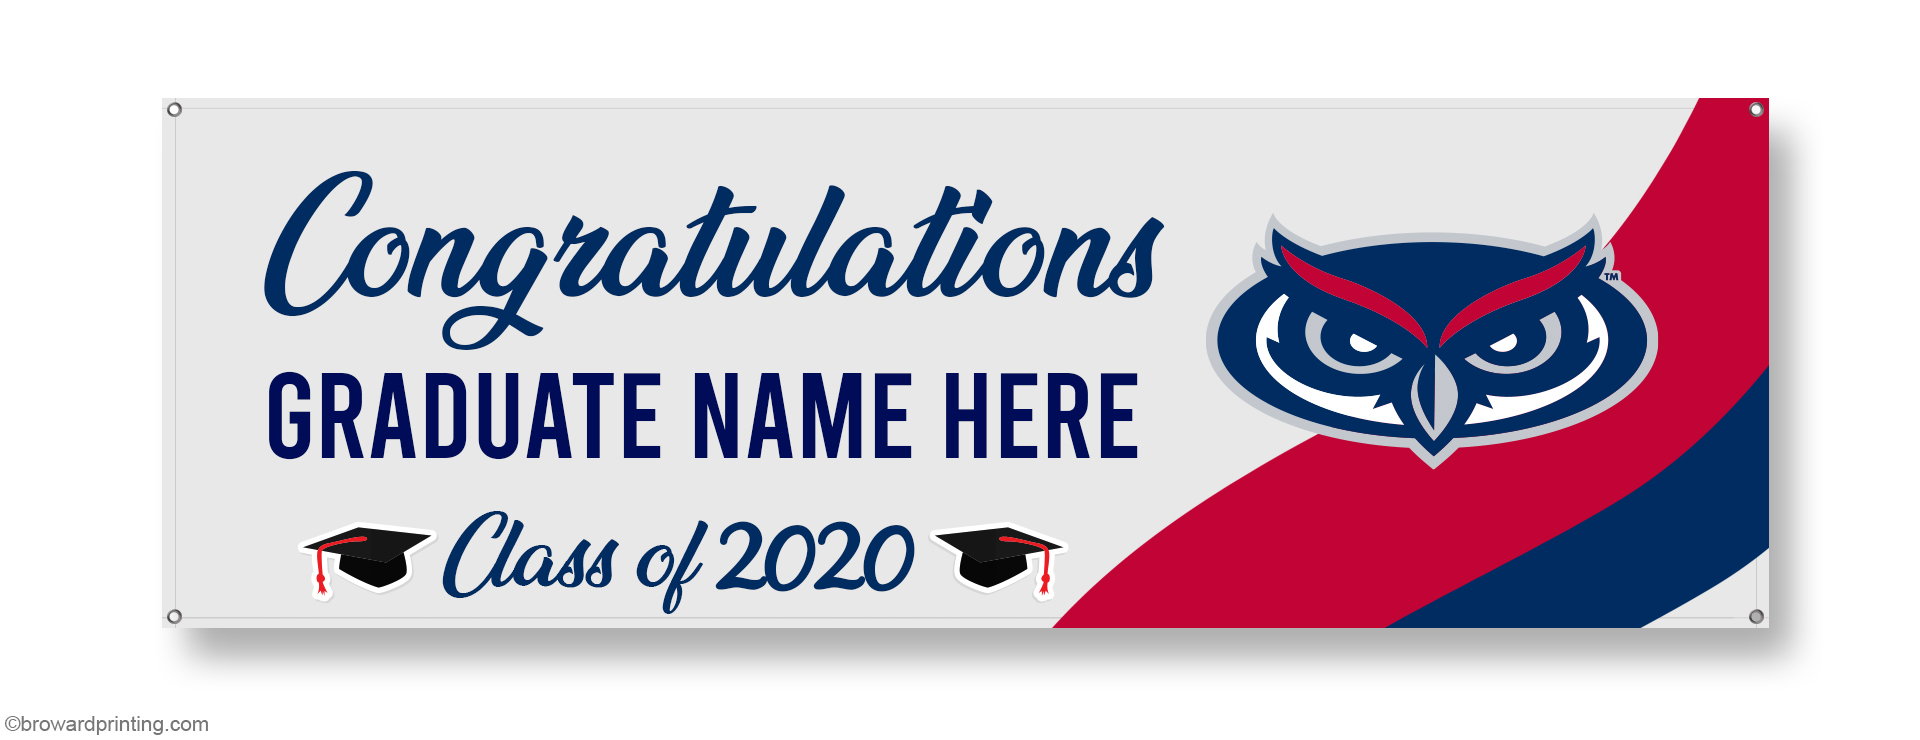 fau graduation banner